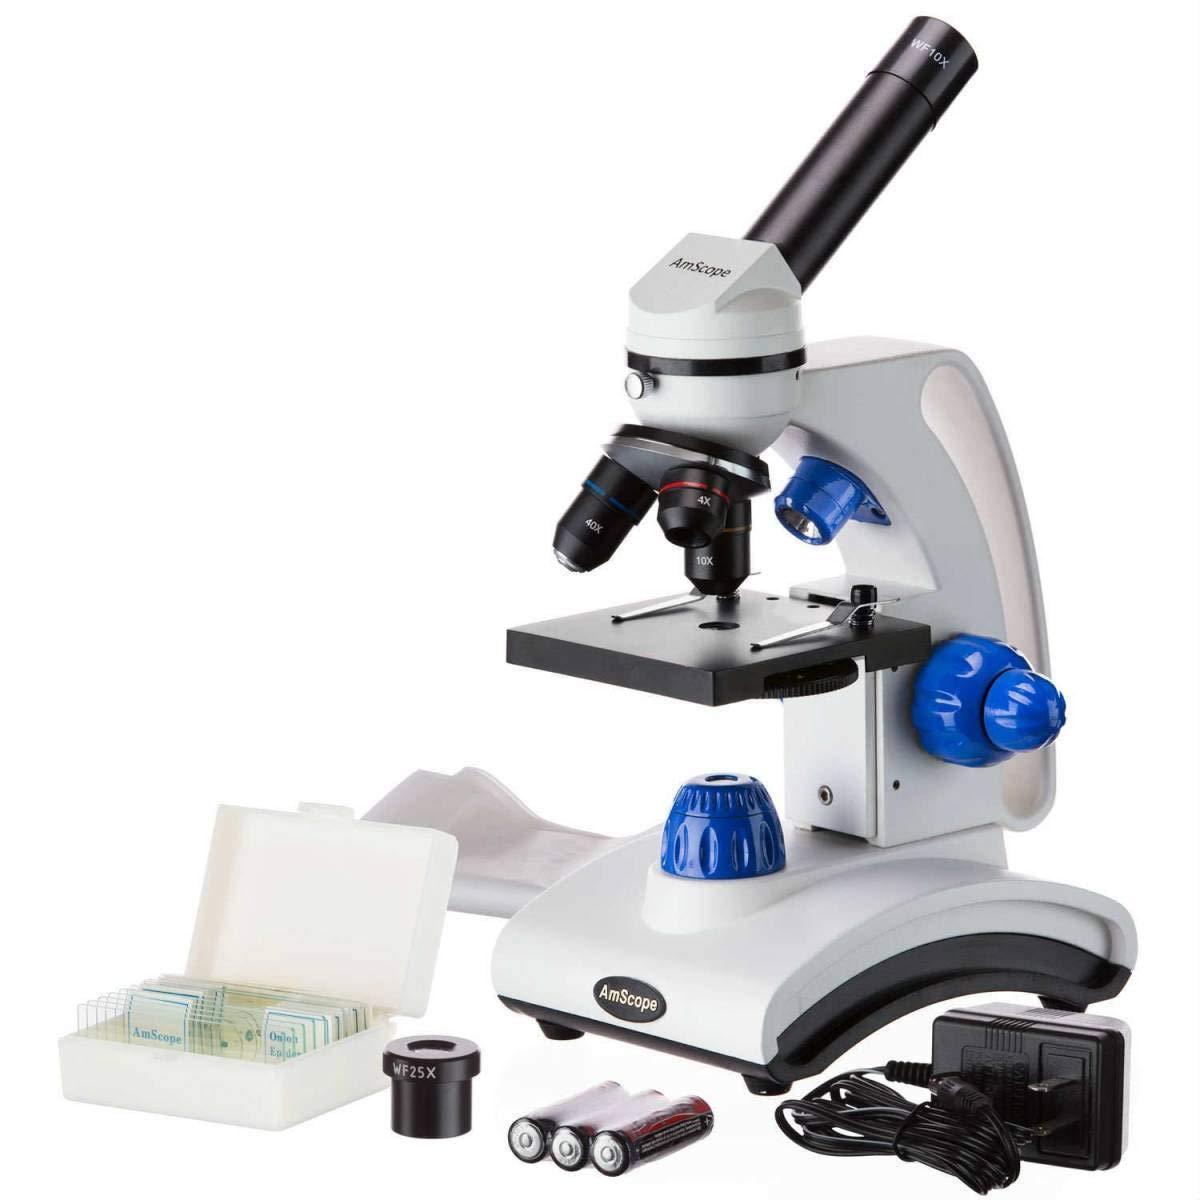 AmScope M162C 2L PB10 40X 1000X Dual Light Glass Lens Metal Frame Student Microscope Slides